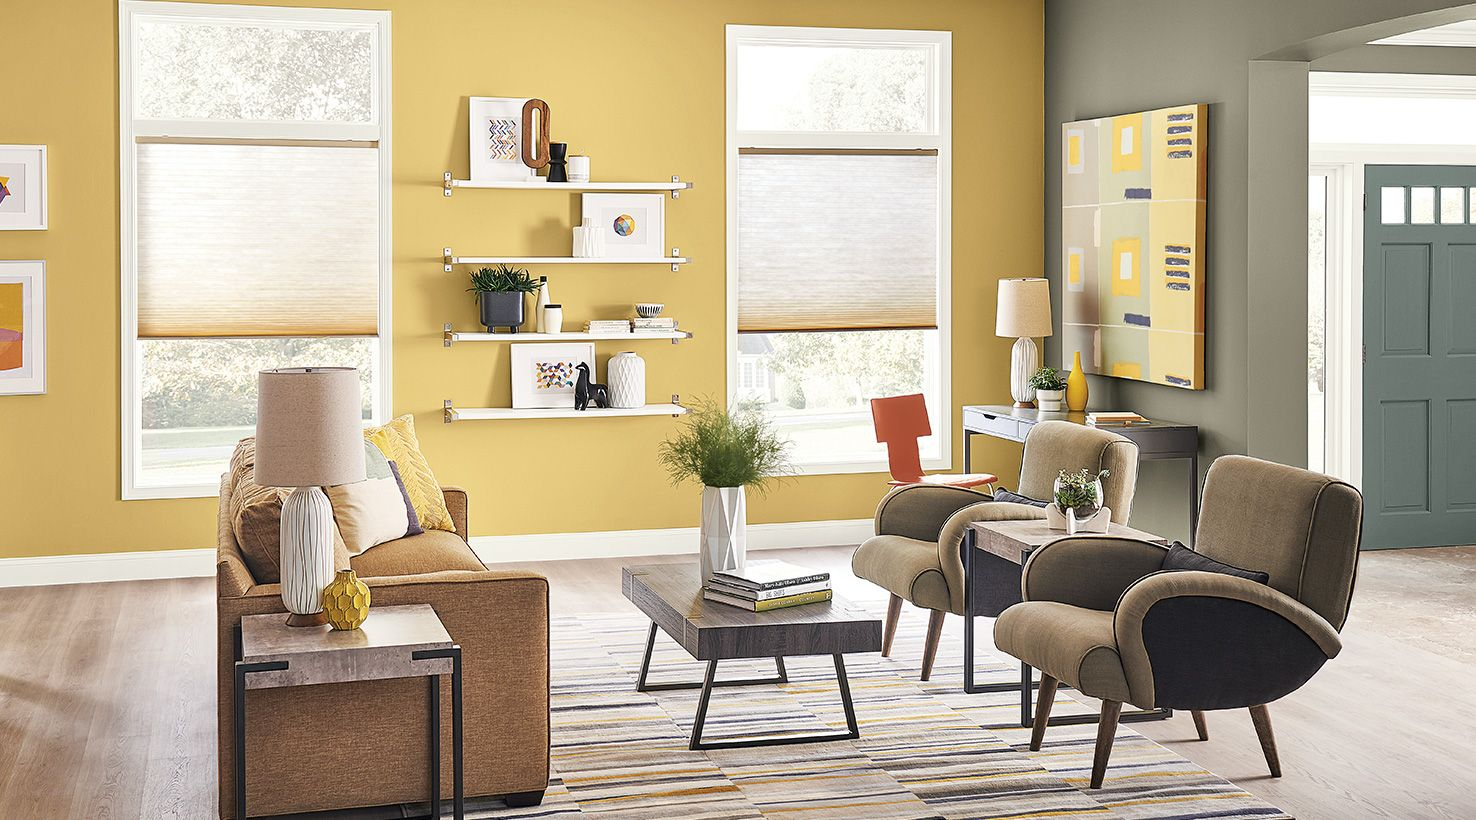 living room paint color ideas inspiration gallery on living room color inspiration id=52539